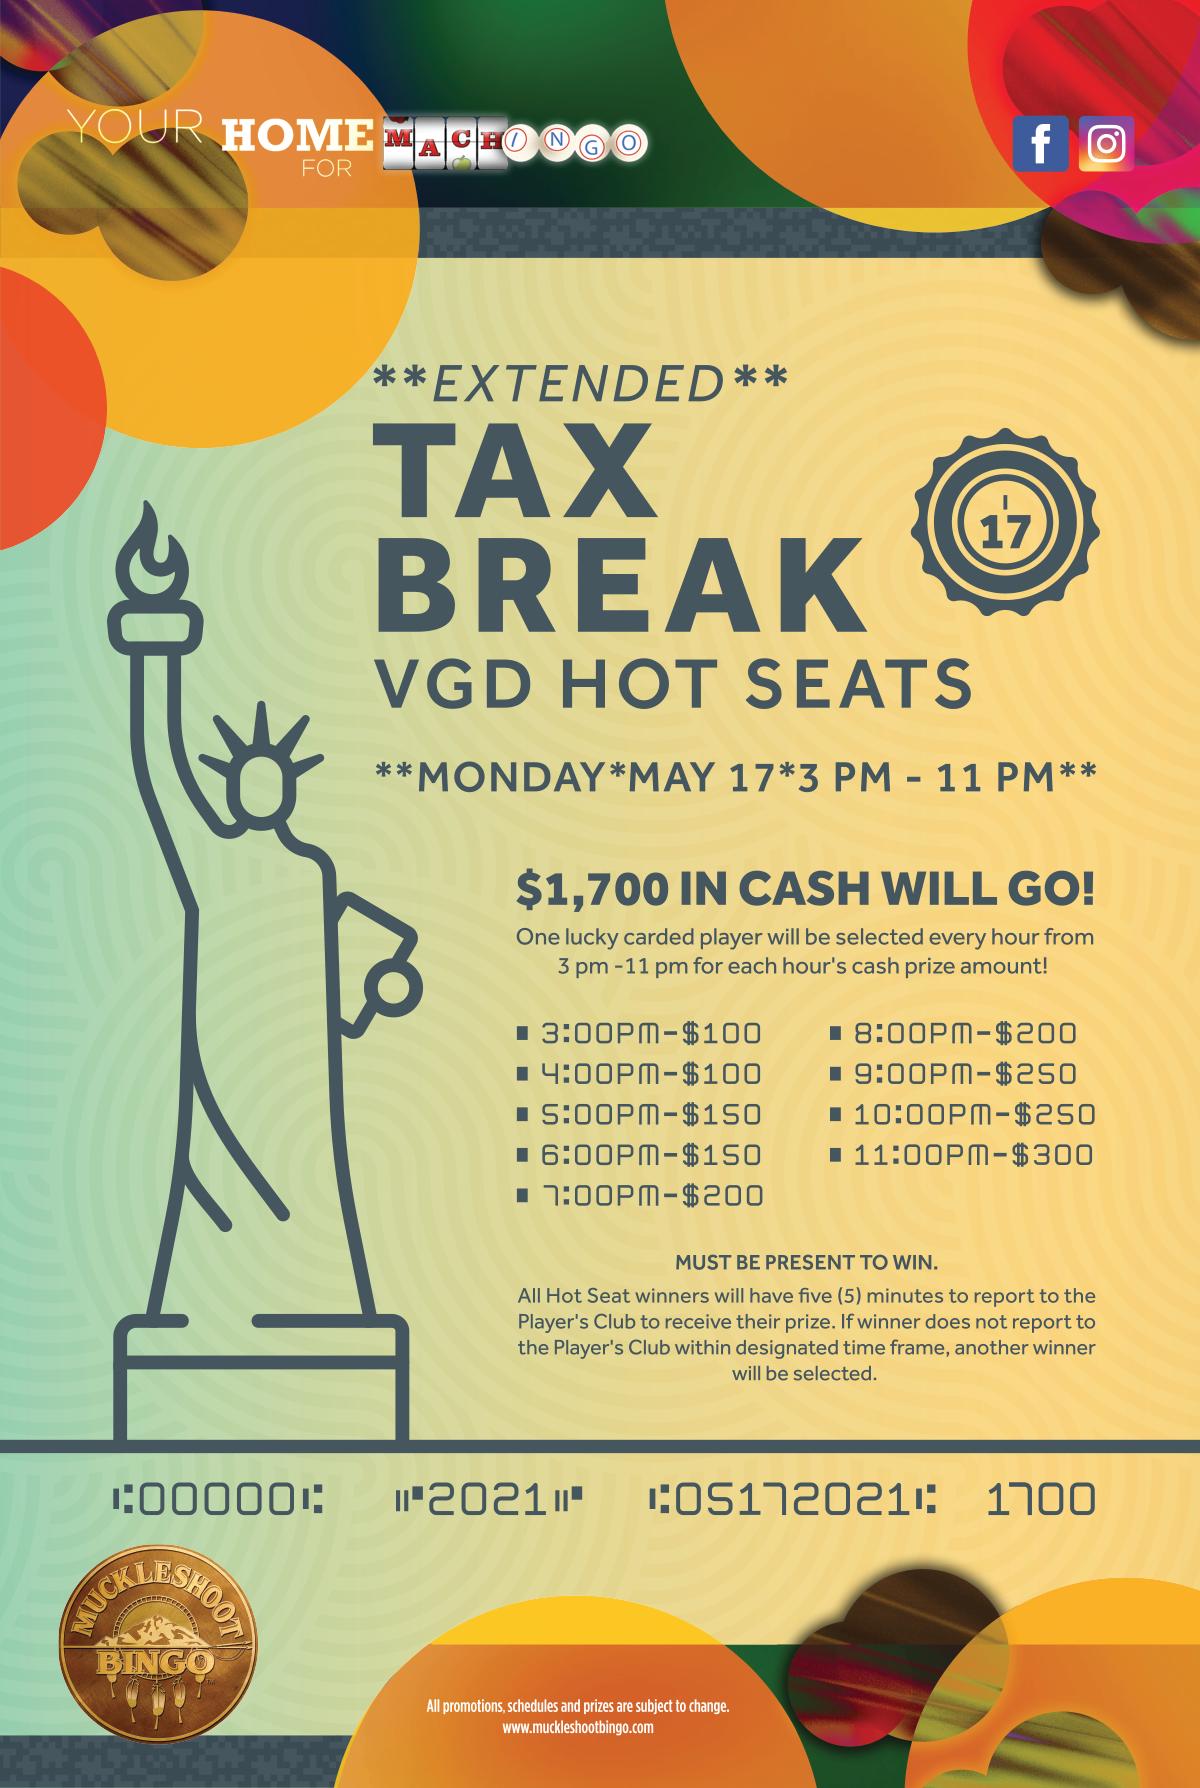 EXTENDED Tax Break VGD Hot Seats